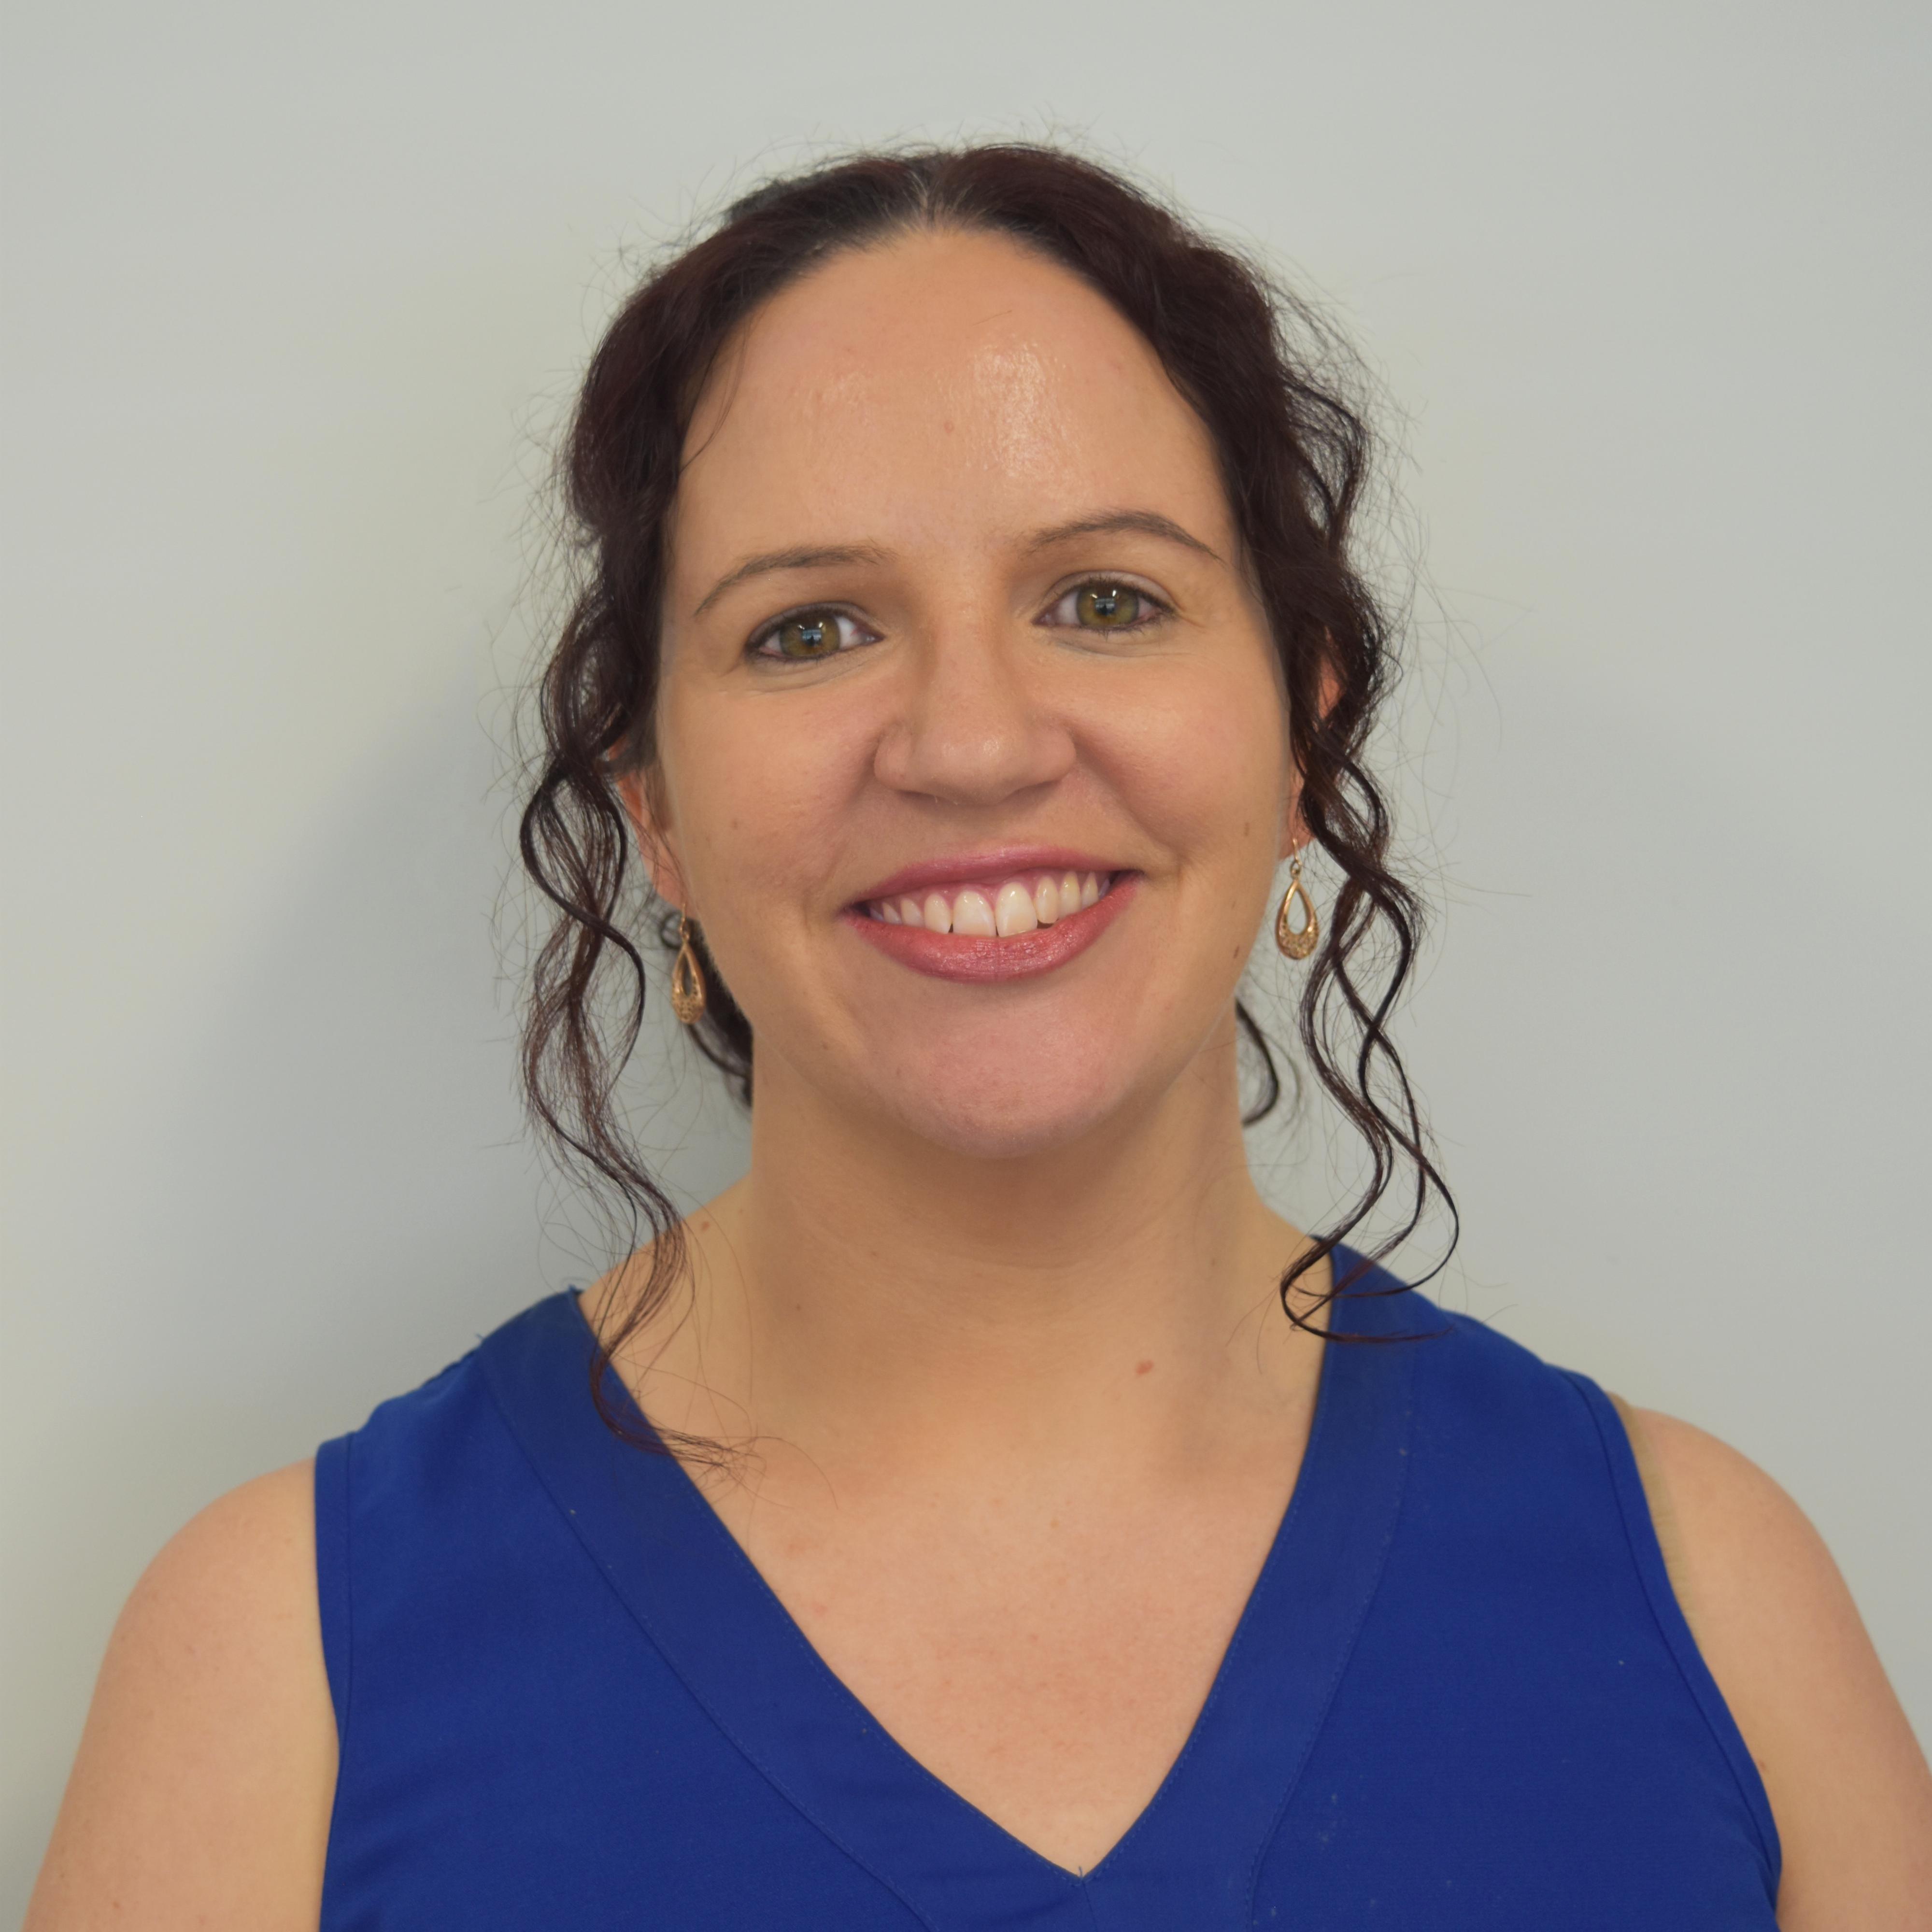 Dr Catherine McQuoid-Mason